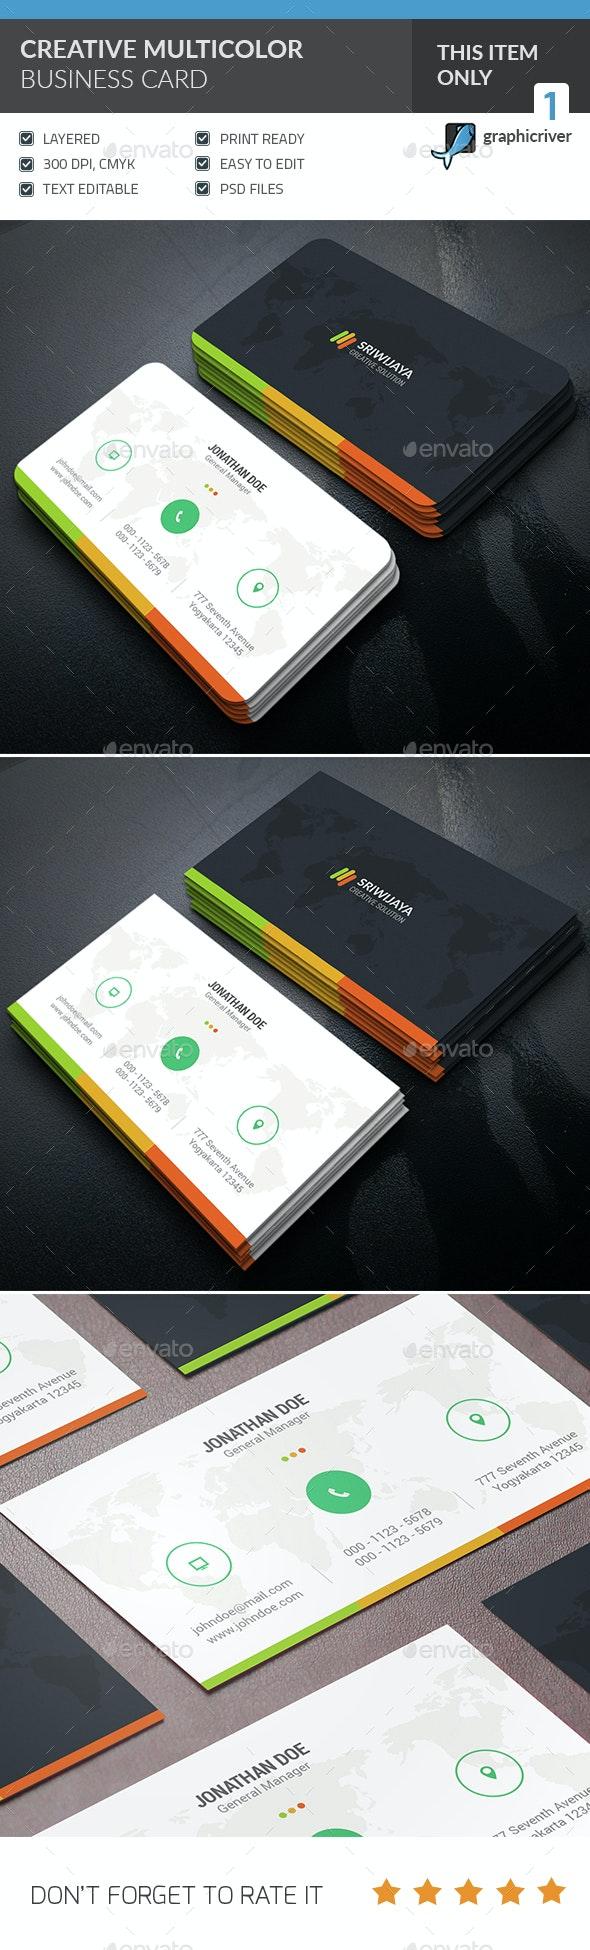 Creative Multicolor Business Card - Creative Business Cards